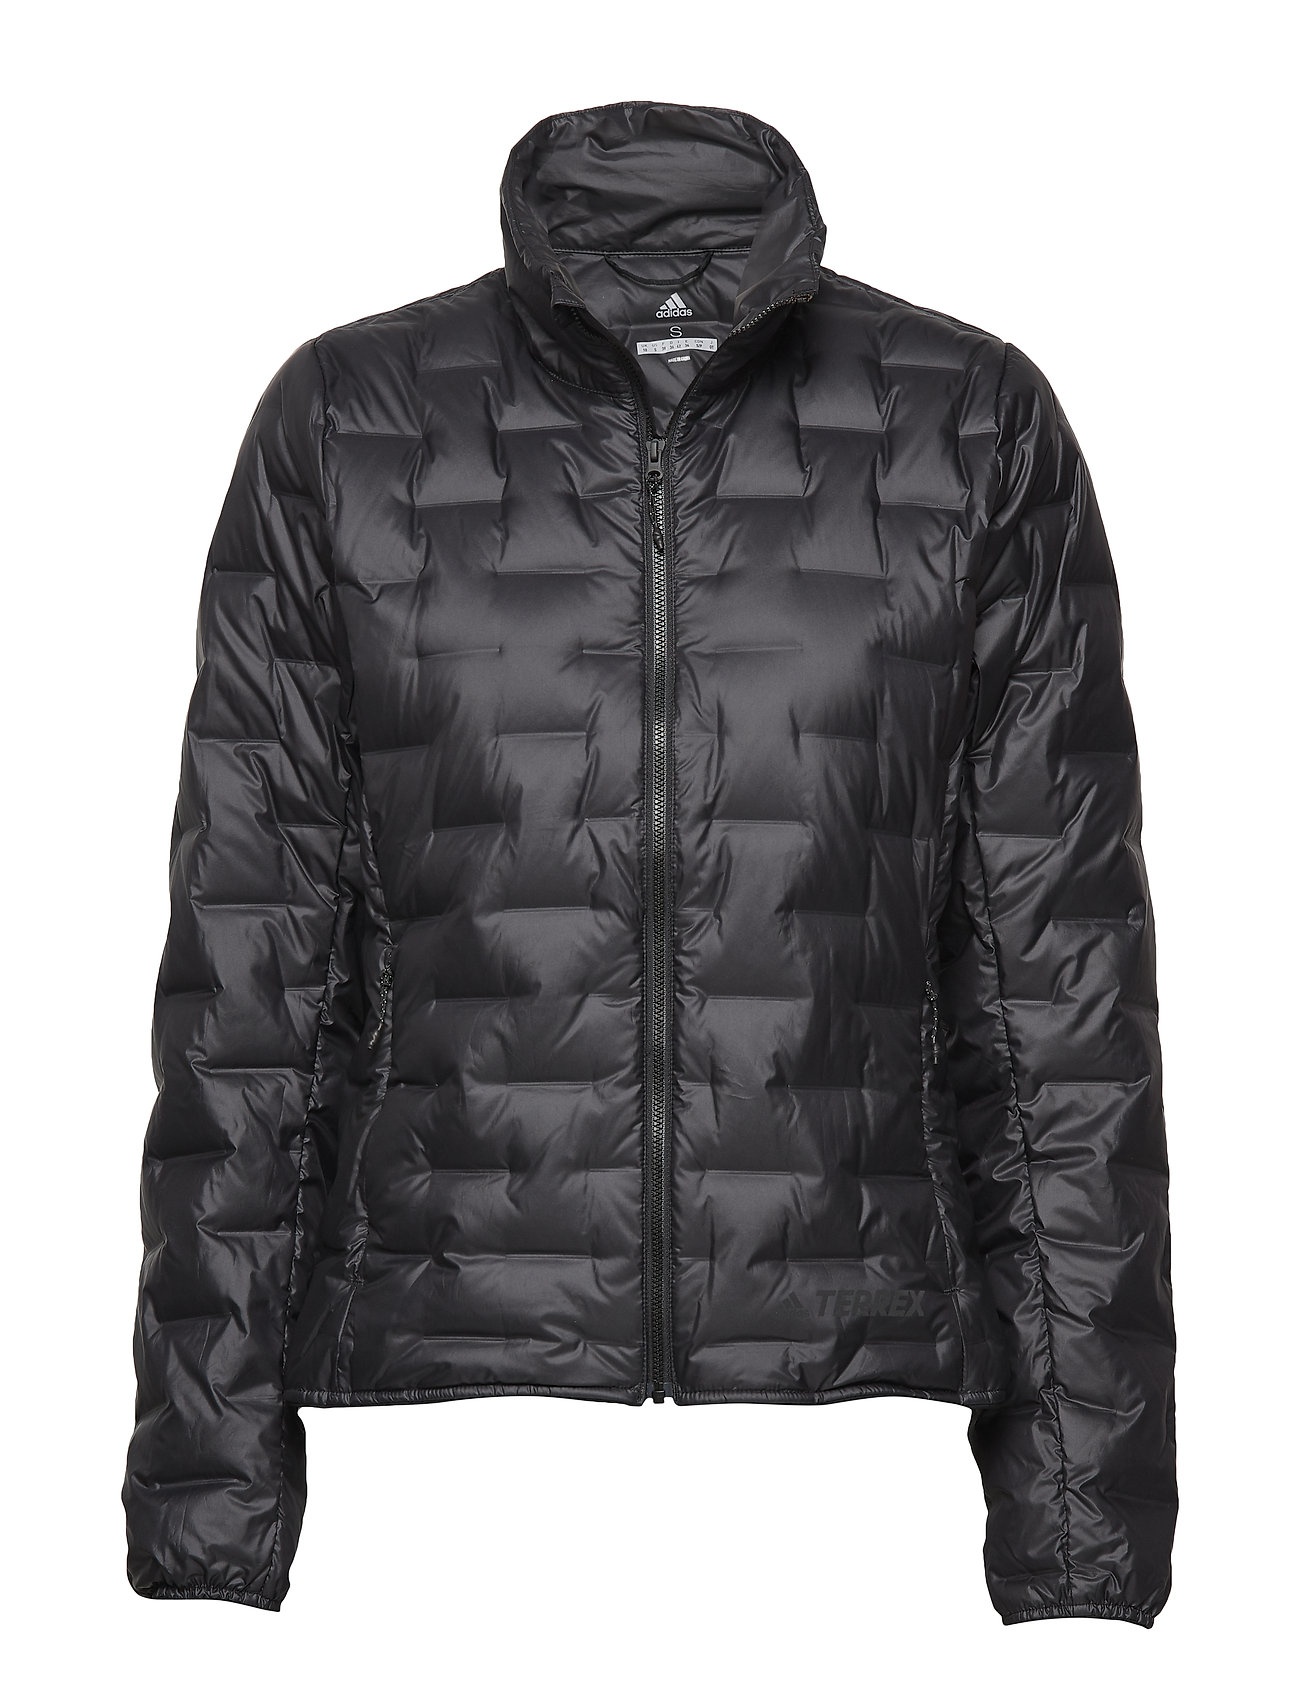 Adidas W Light Down Jk Ytterkläder